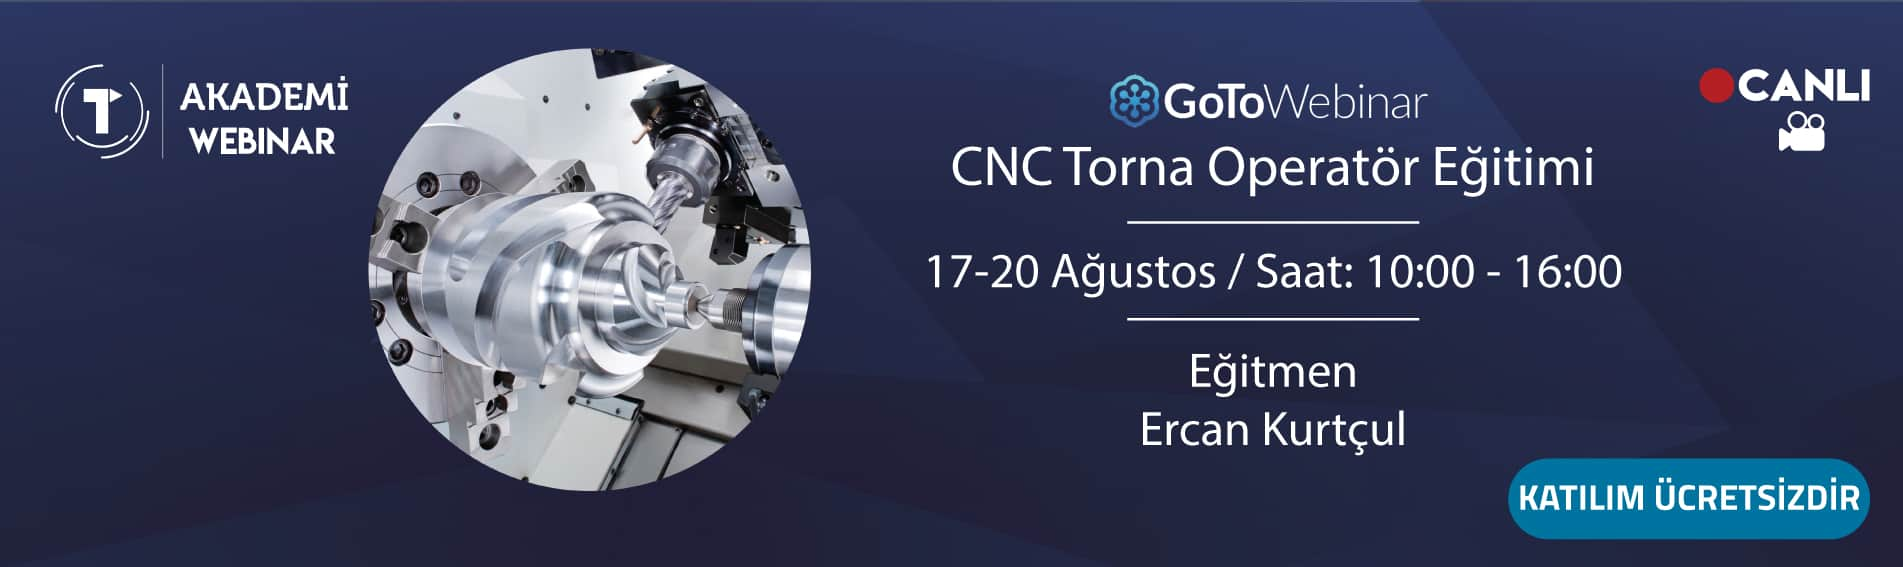 CNC Torna Eğitimi 17-20 Ağustos